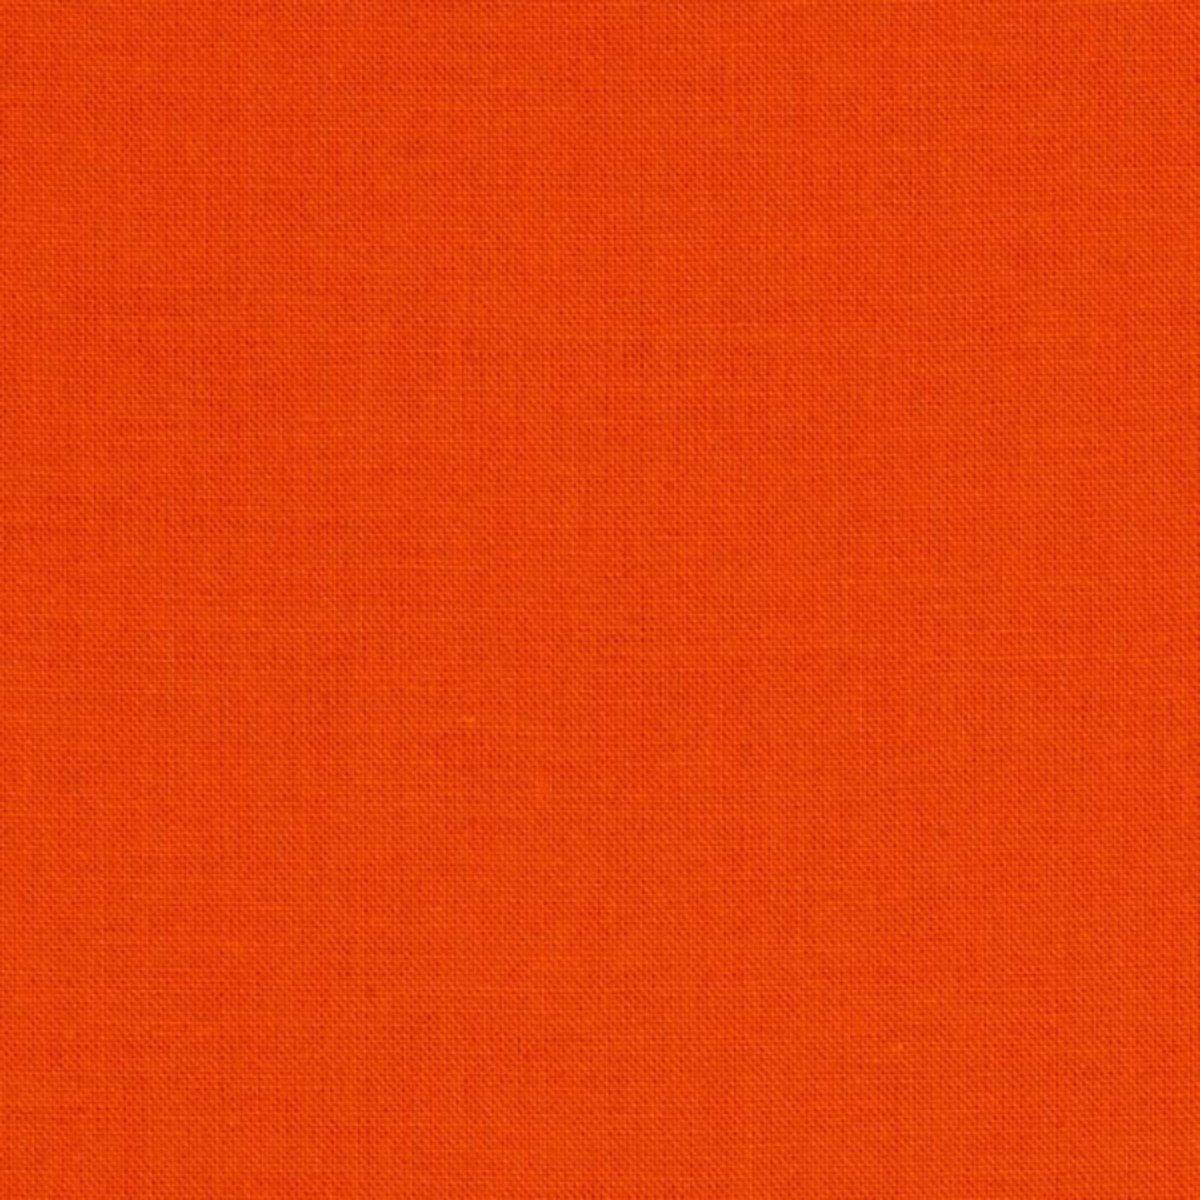 Kona Cotton in Carrot for Robert Kaufman